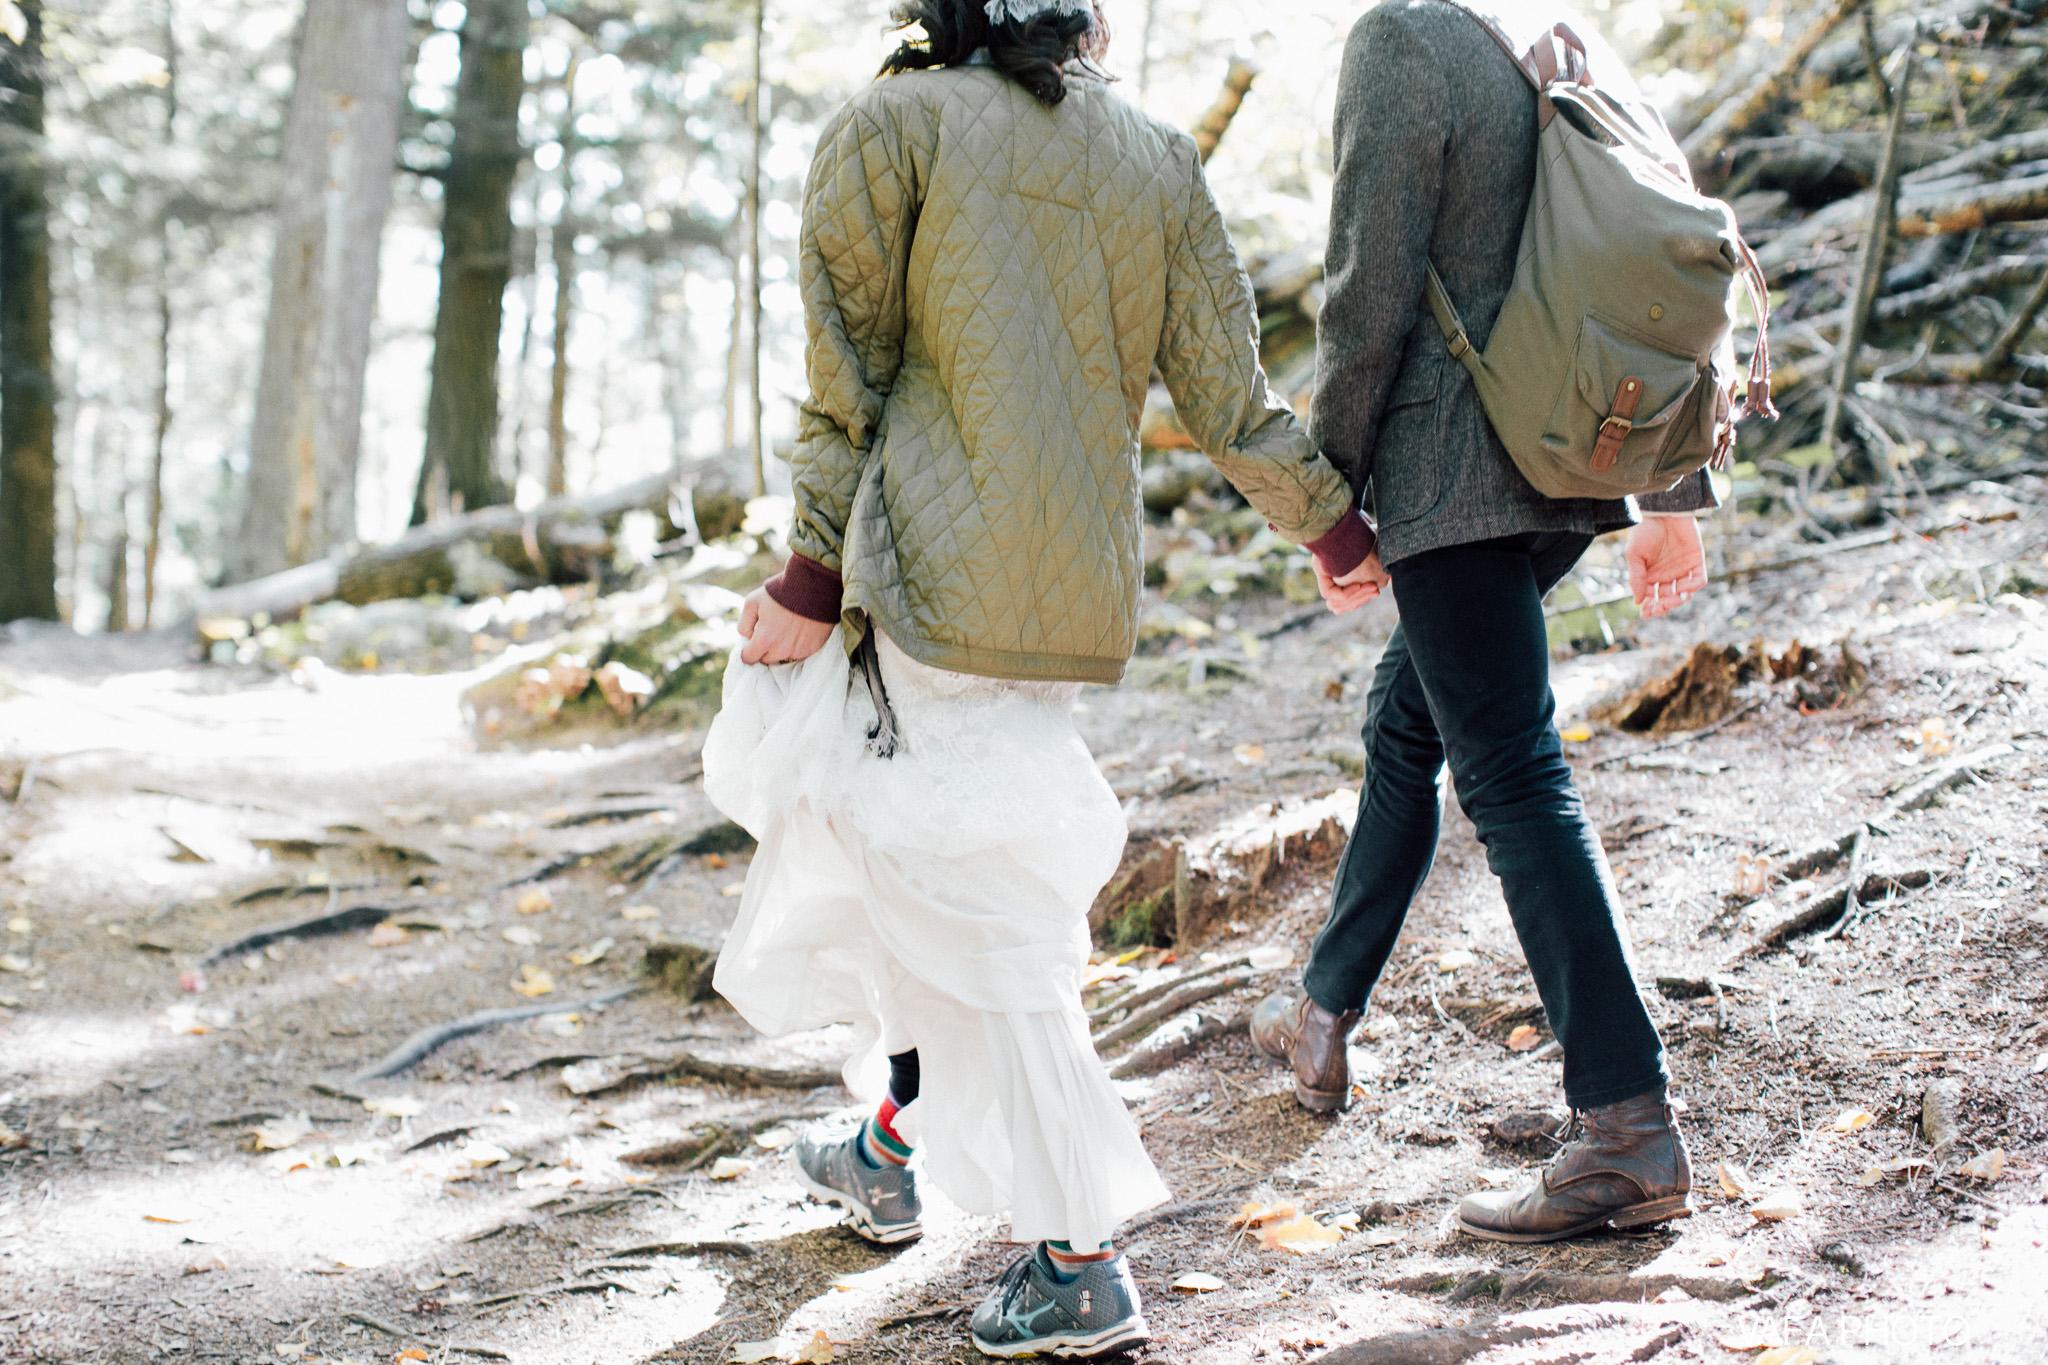 Hogback-Mountain-Wedding-Chelsea-Josh-Vafa-Photo-466.jpg